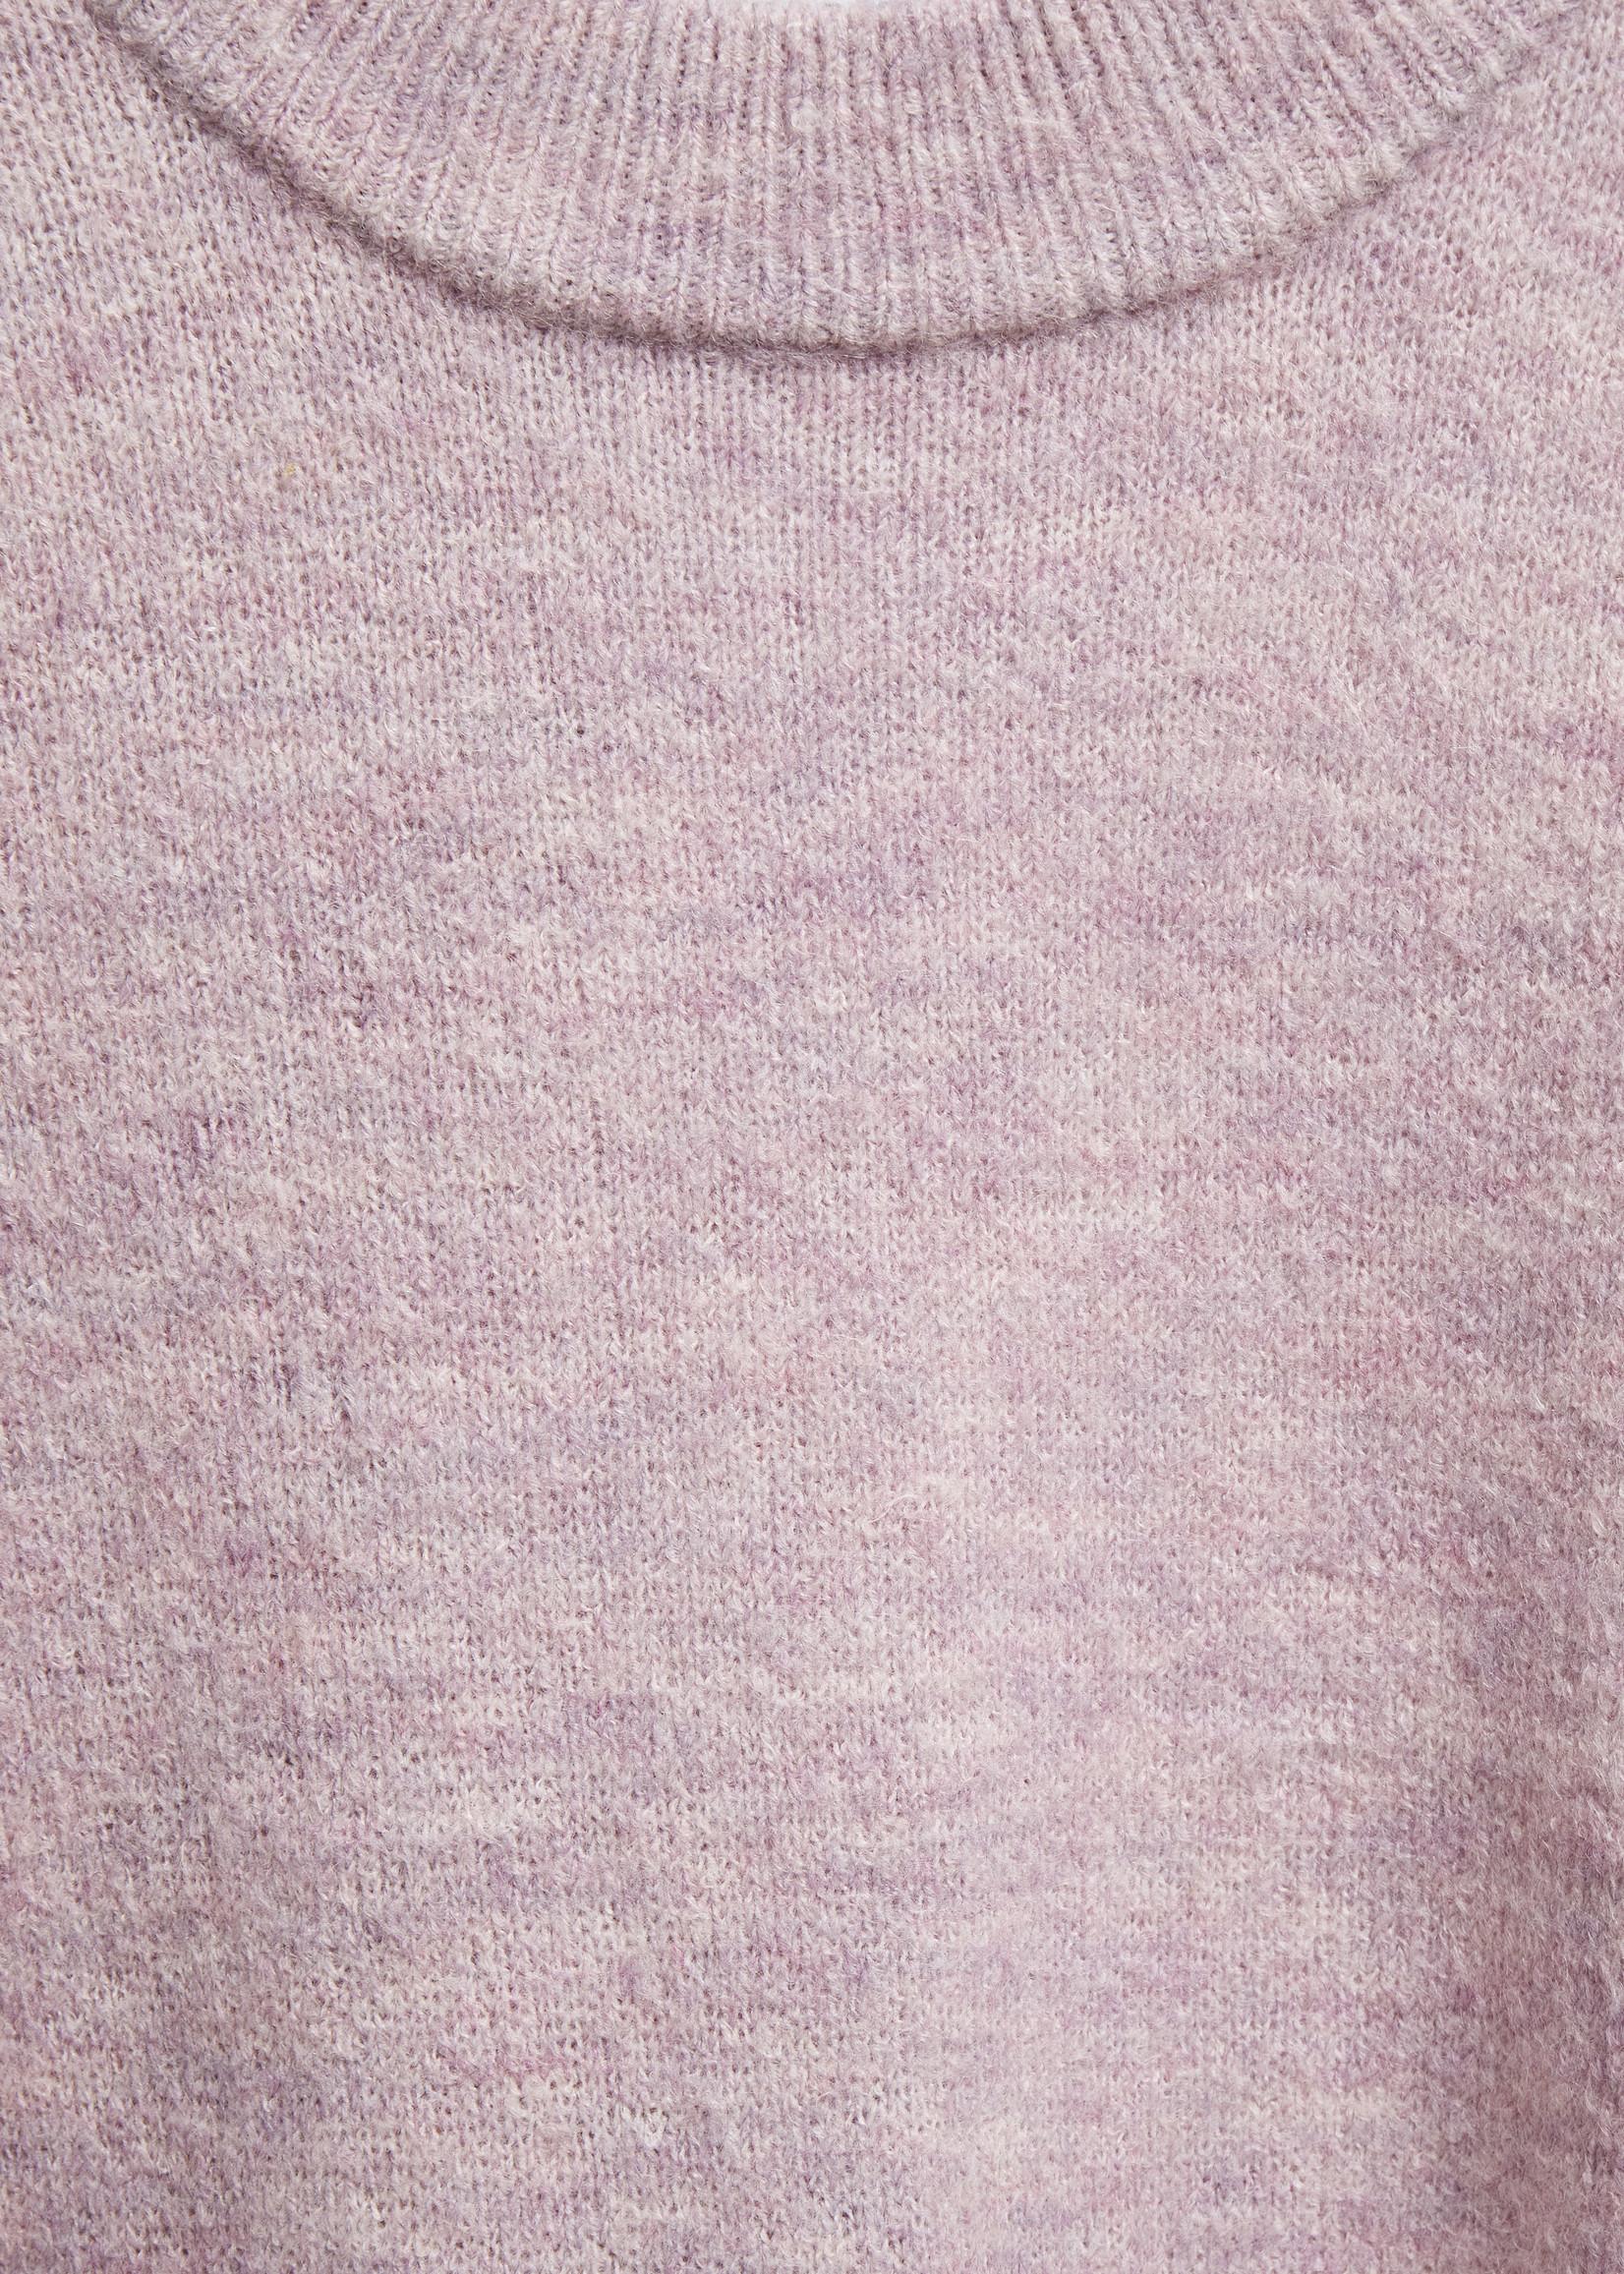 Desires Desires Elis Tee Pullover